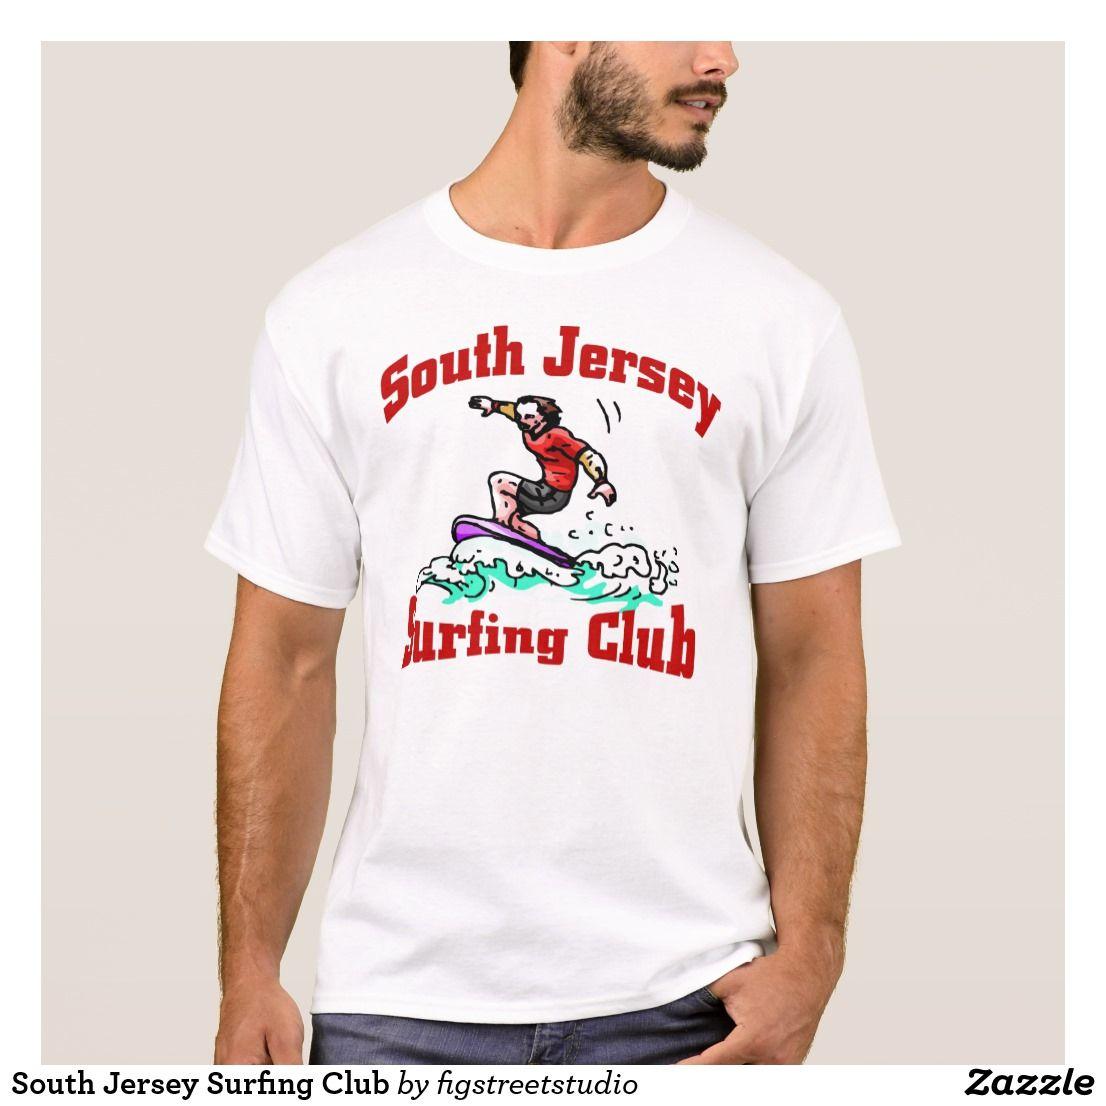 South Jersey Surfing Club T Shirt Zazzle Com T Shirt Shirts Mens Tops